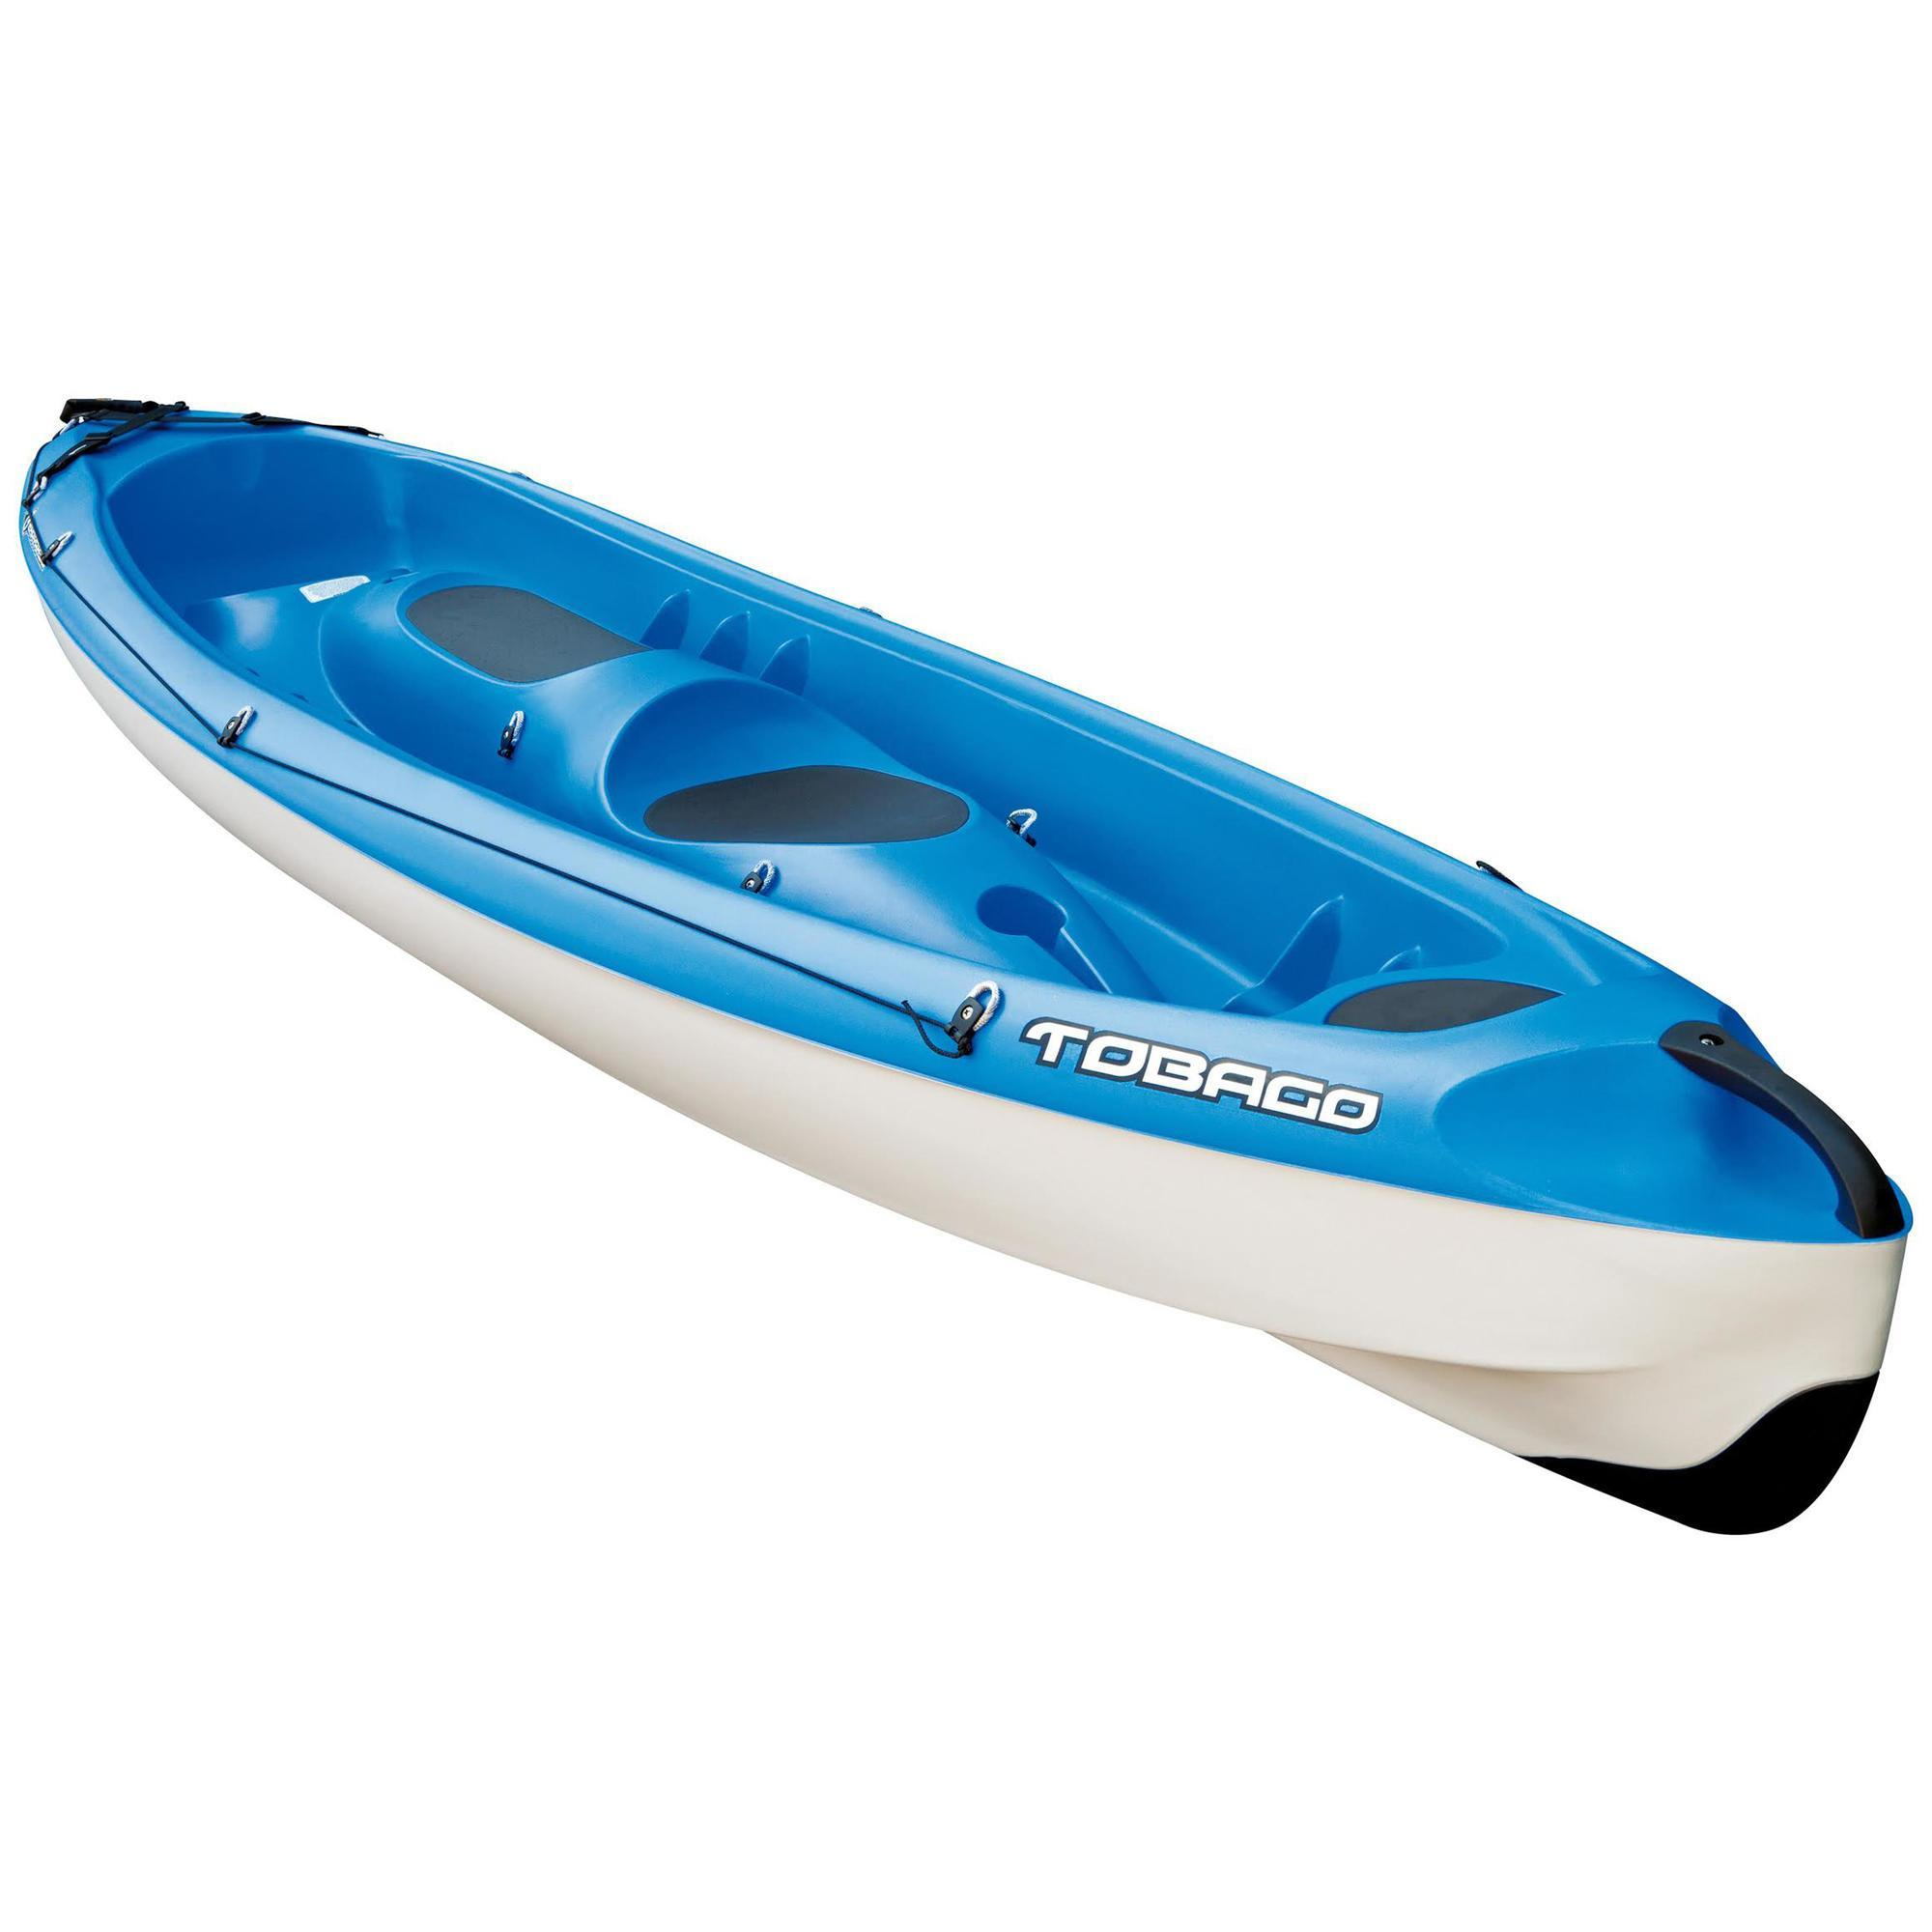 Carte Bleue Kayak.Canoe Kayak Tobago Rigide 3 Places 2 Adultes 1 Enfant